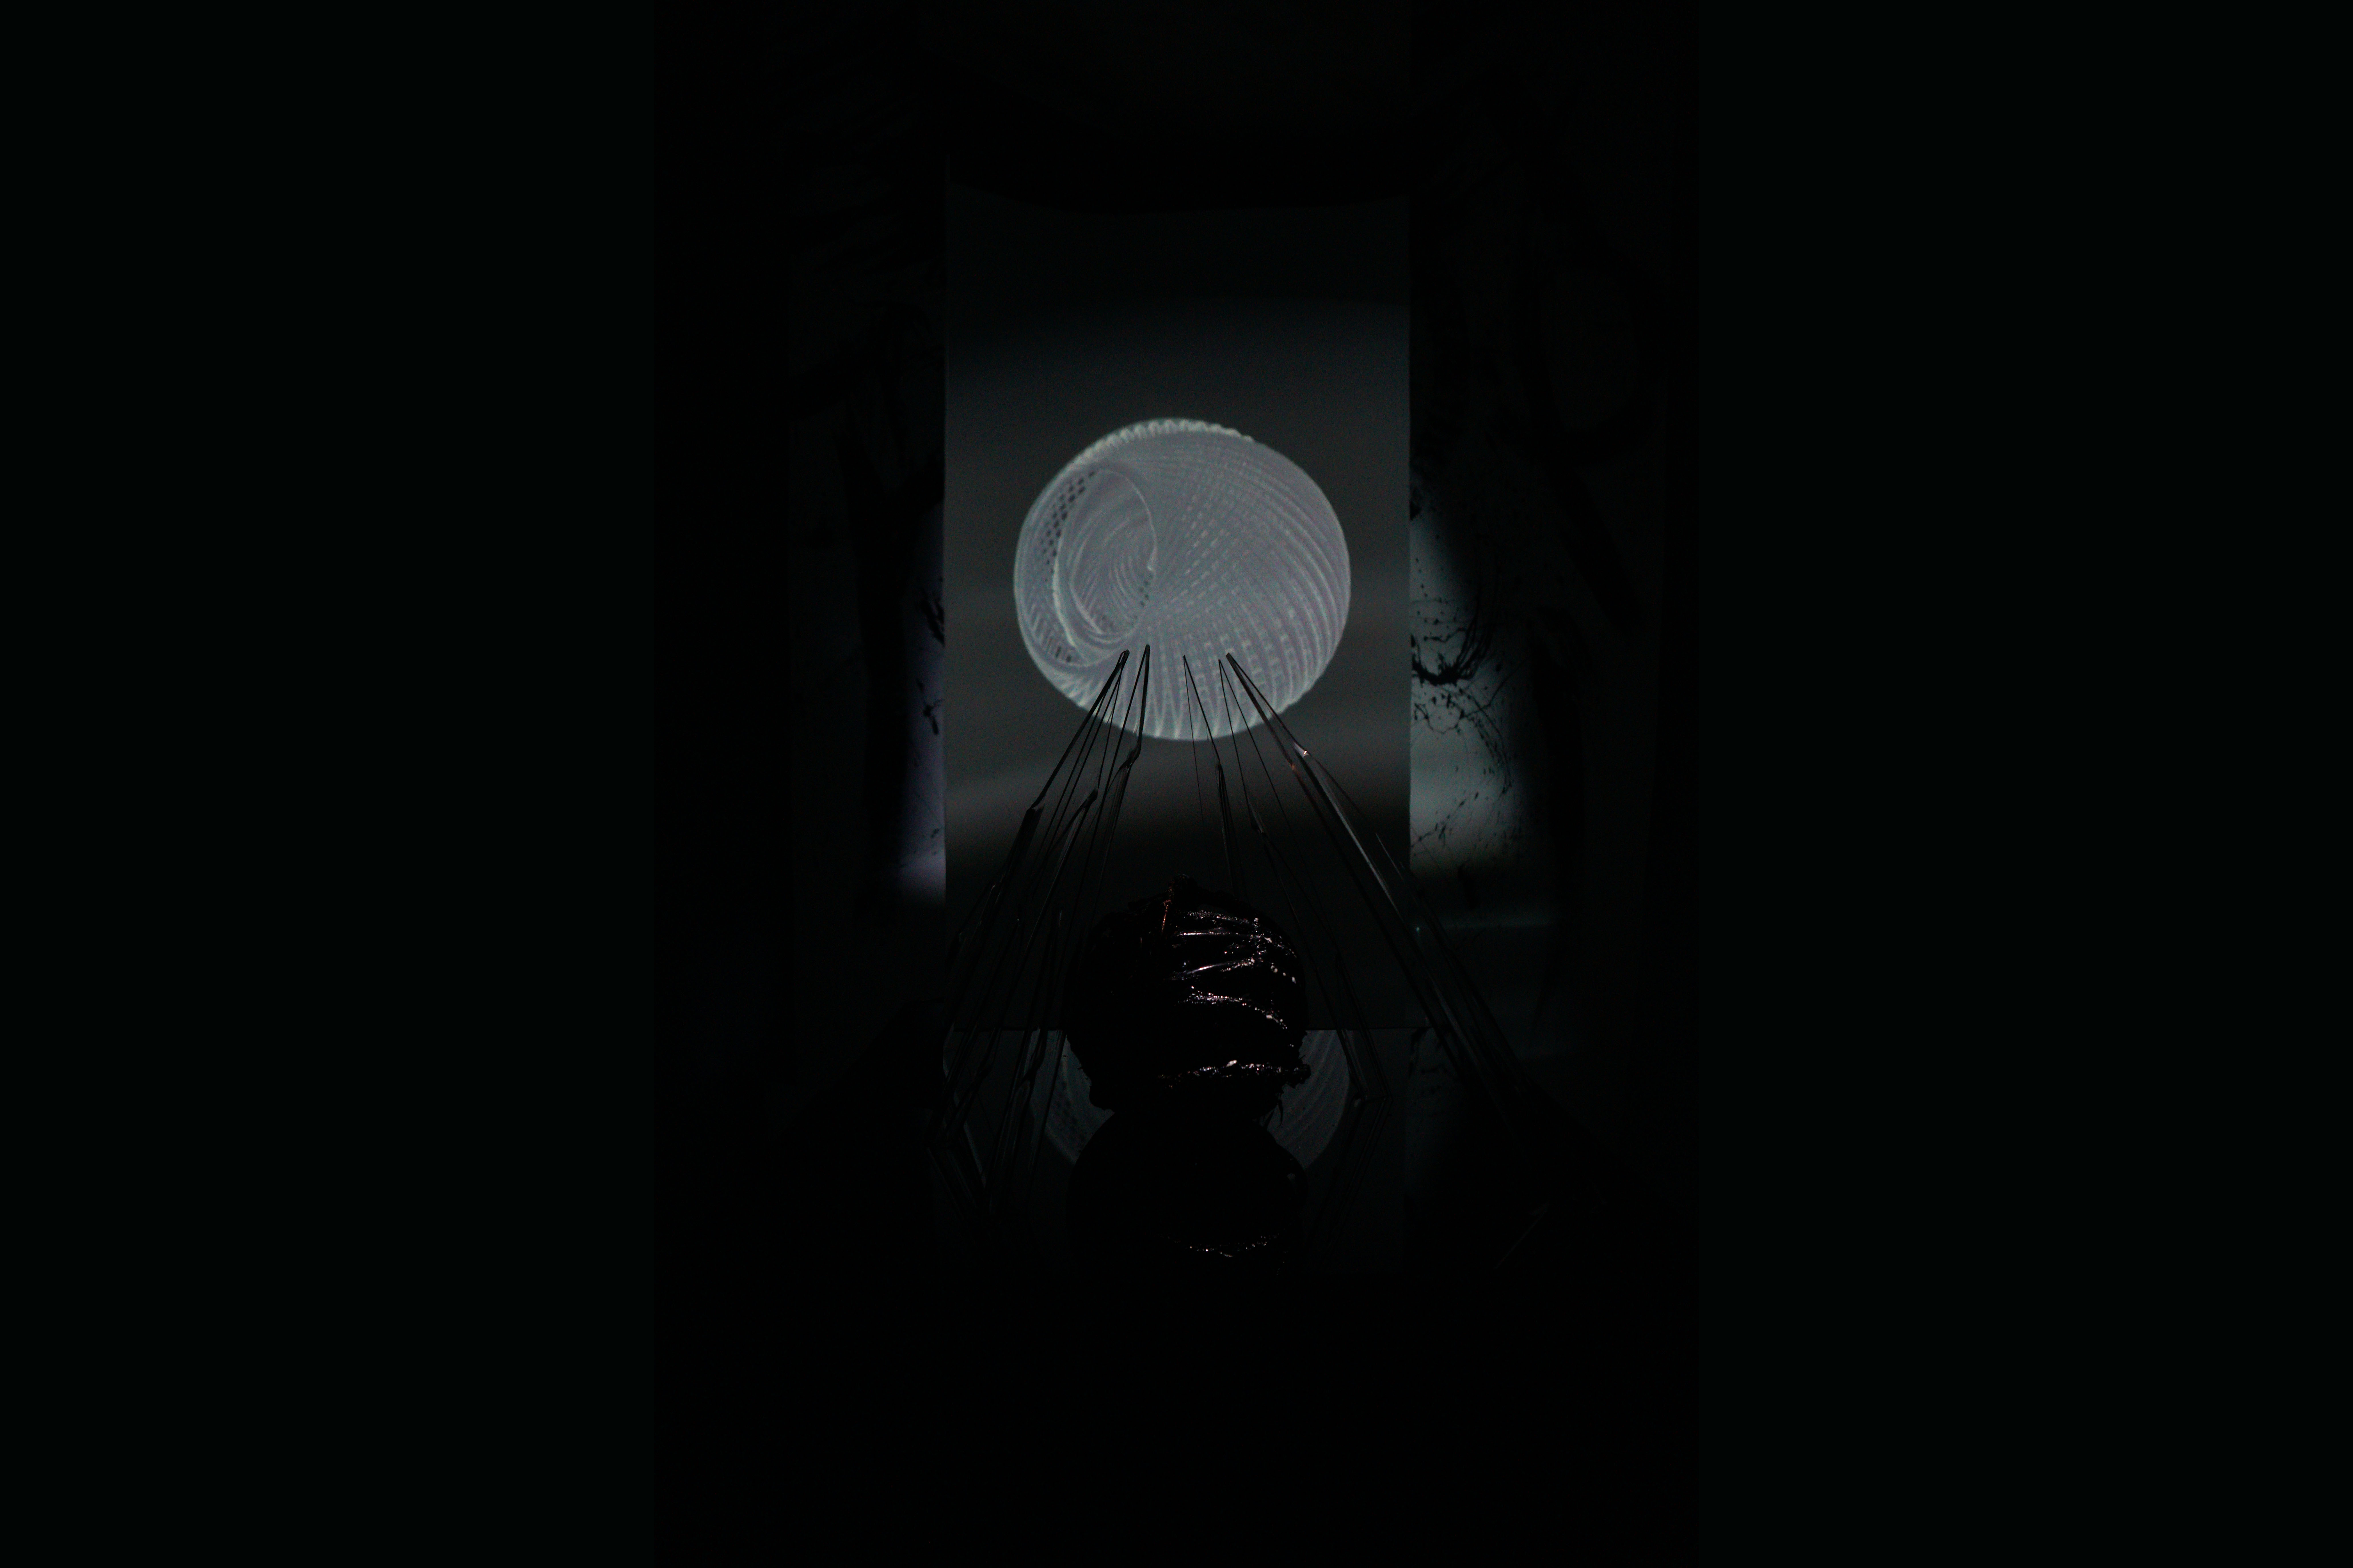 Trilo_Roman-Leave_Your_Darkness_Alone_2